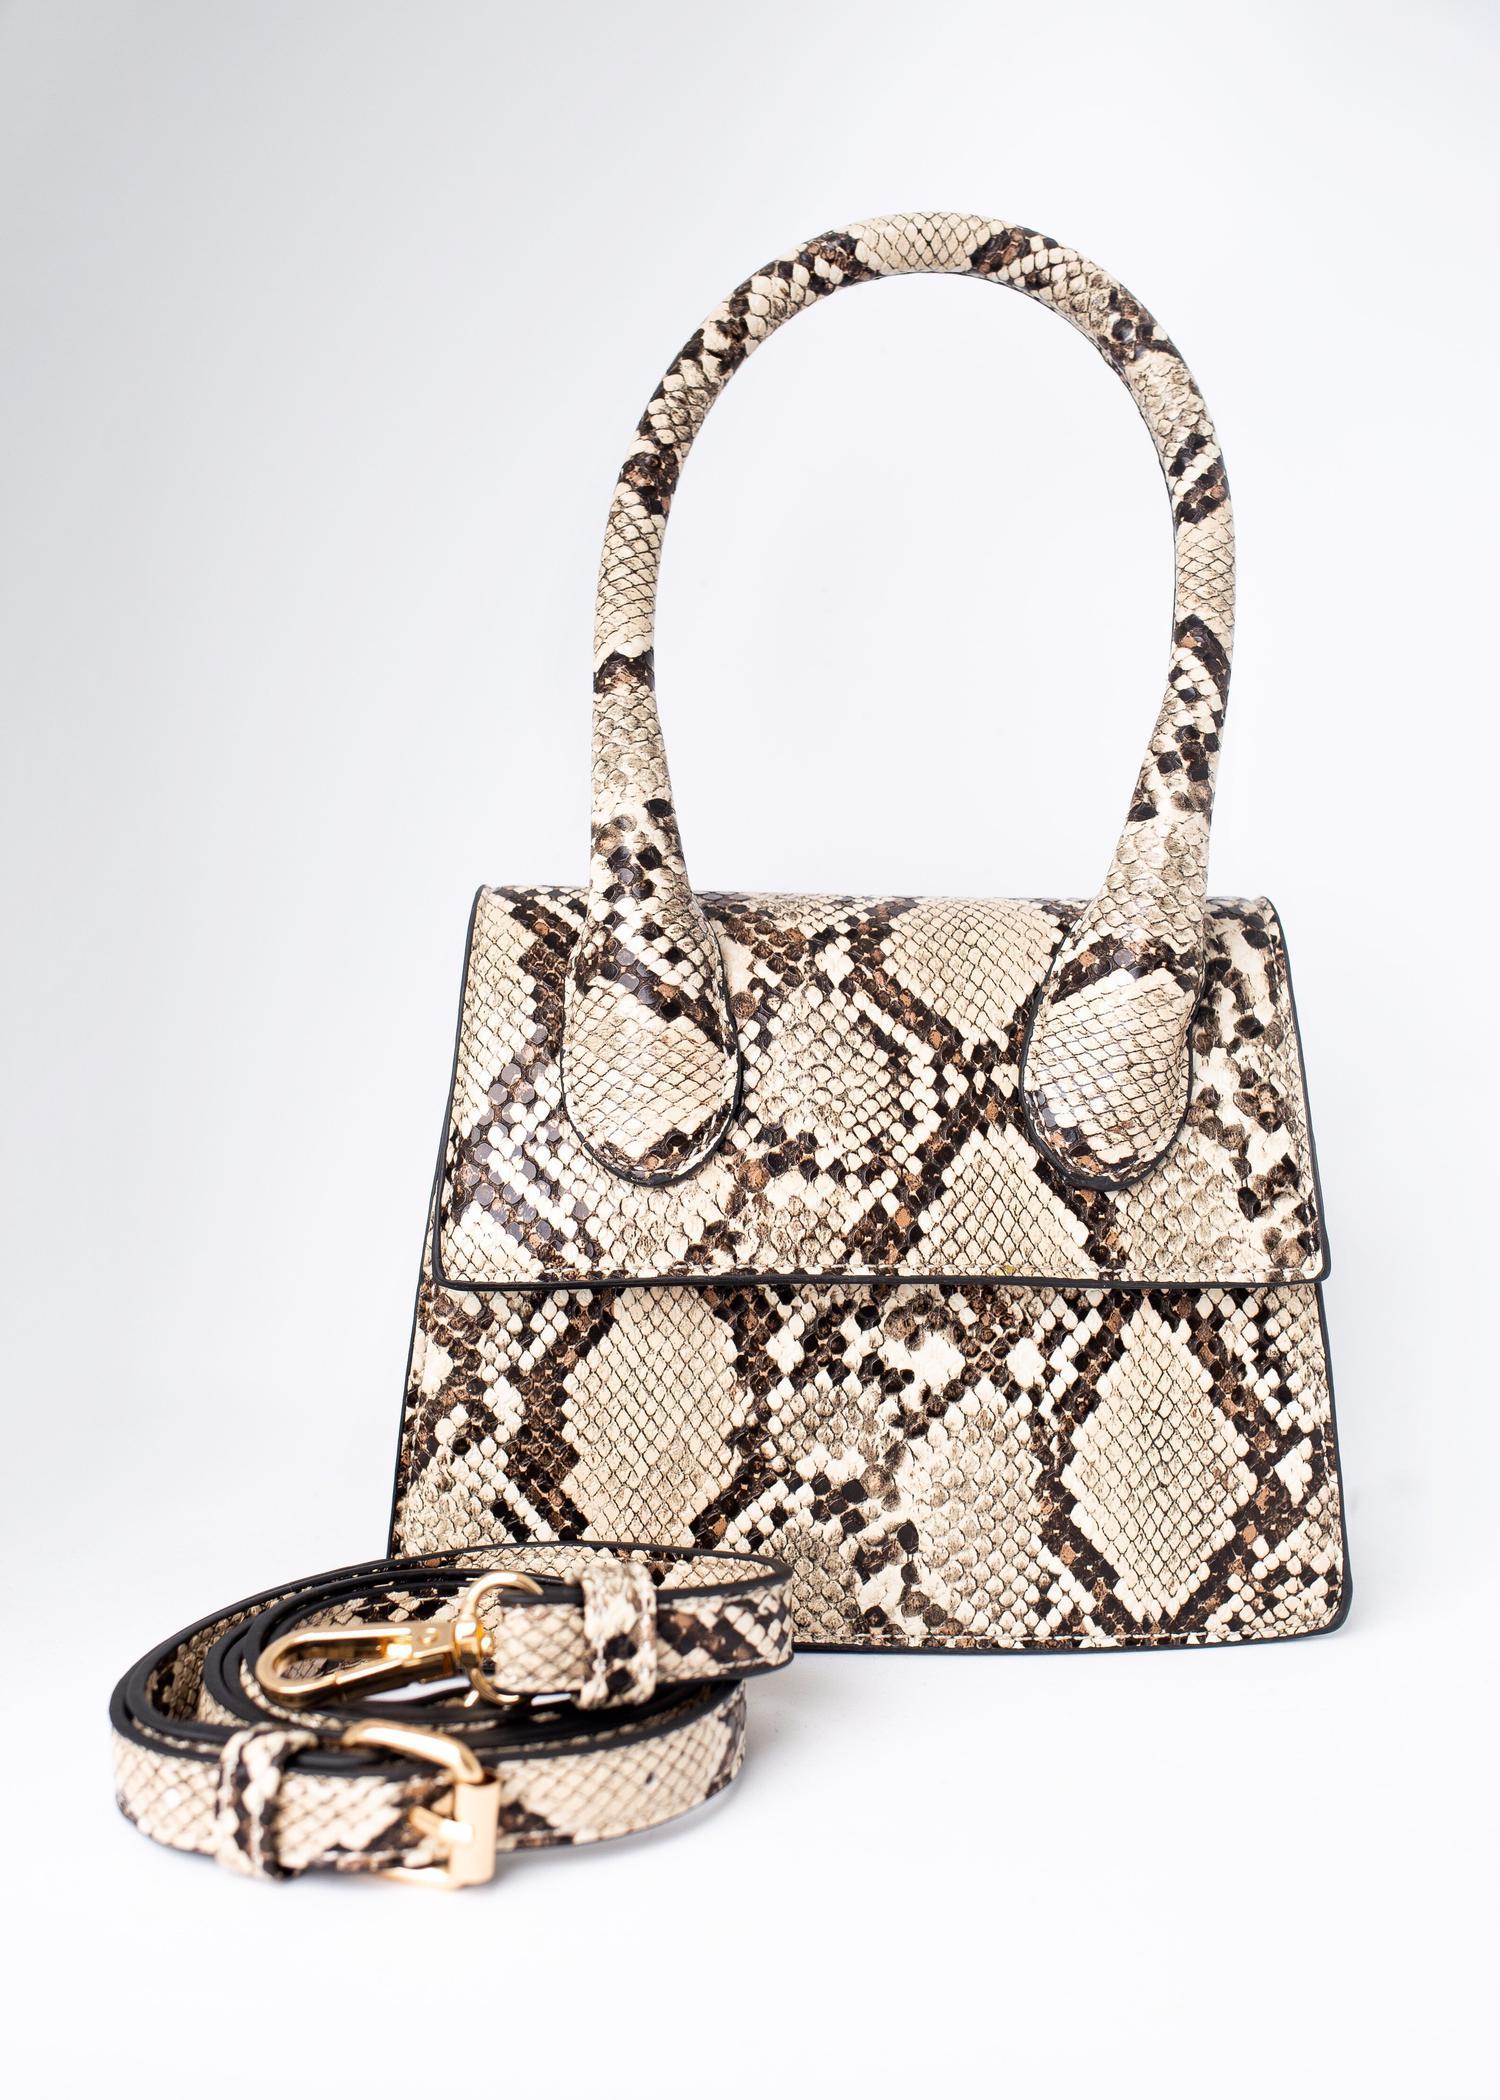 Diva Boutique product